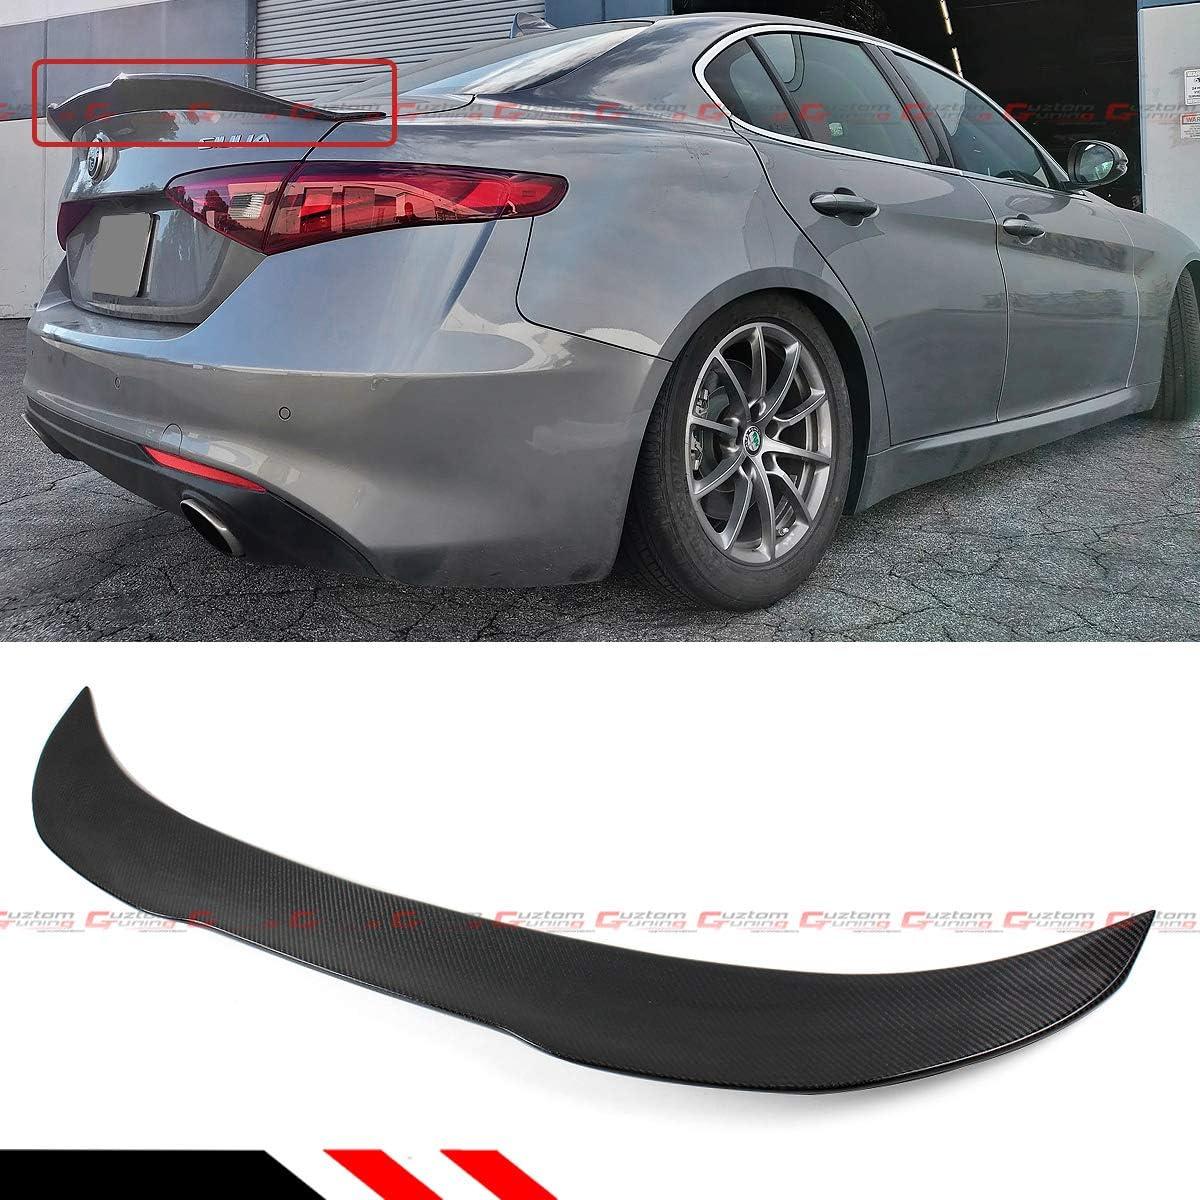 Cuztom Tuning Fits for 2017-2020 Alfa Romeo Giulia Quadrifoglio PSM Highkick Duckbill Carbon Fiber Trunk Lid Spoiler Wing CF